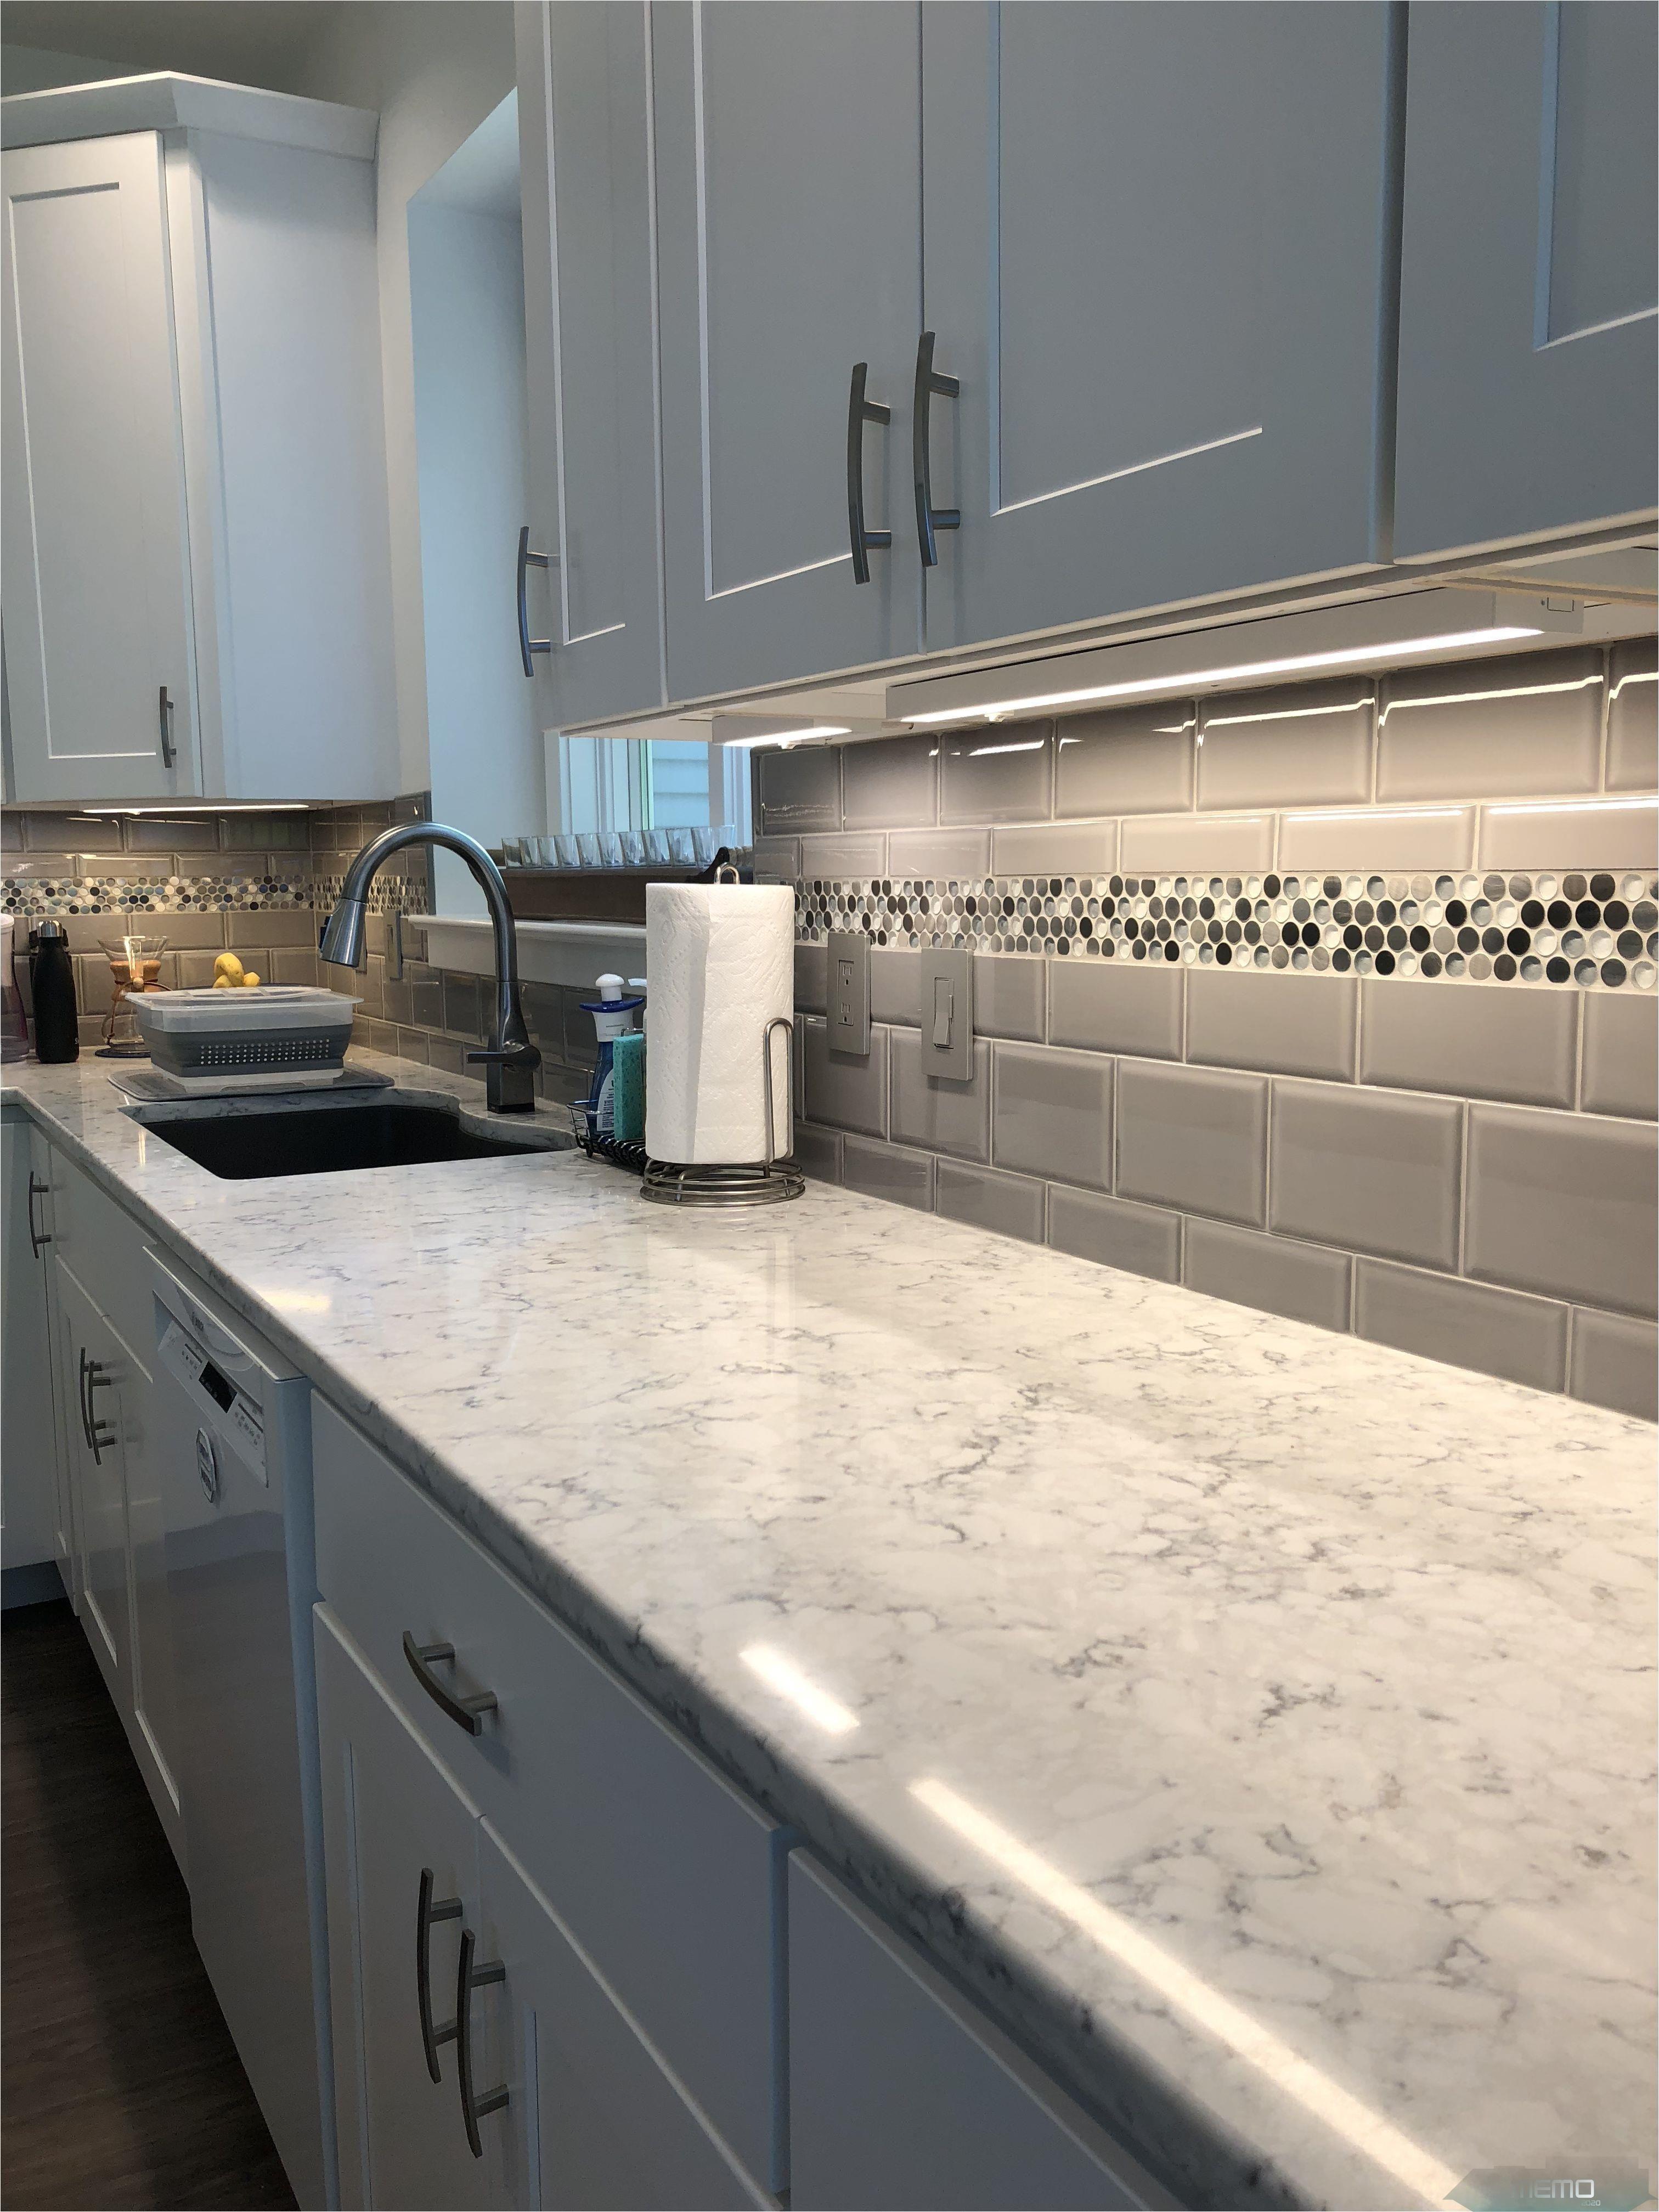 Jul 24 2018 G R Mitchell Inc Features Kitchen Cabinet Displays In Willow Street In 2020 Kitchen Furniture Design Kitchen Design Small Kitchen Backsplash Designs